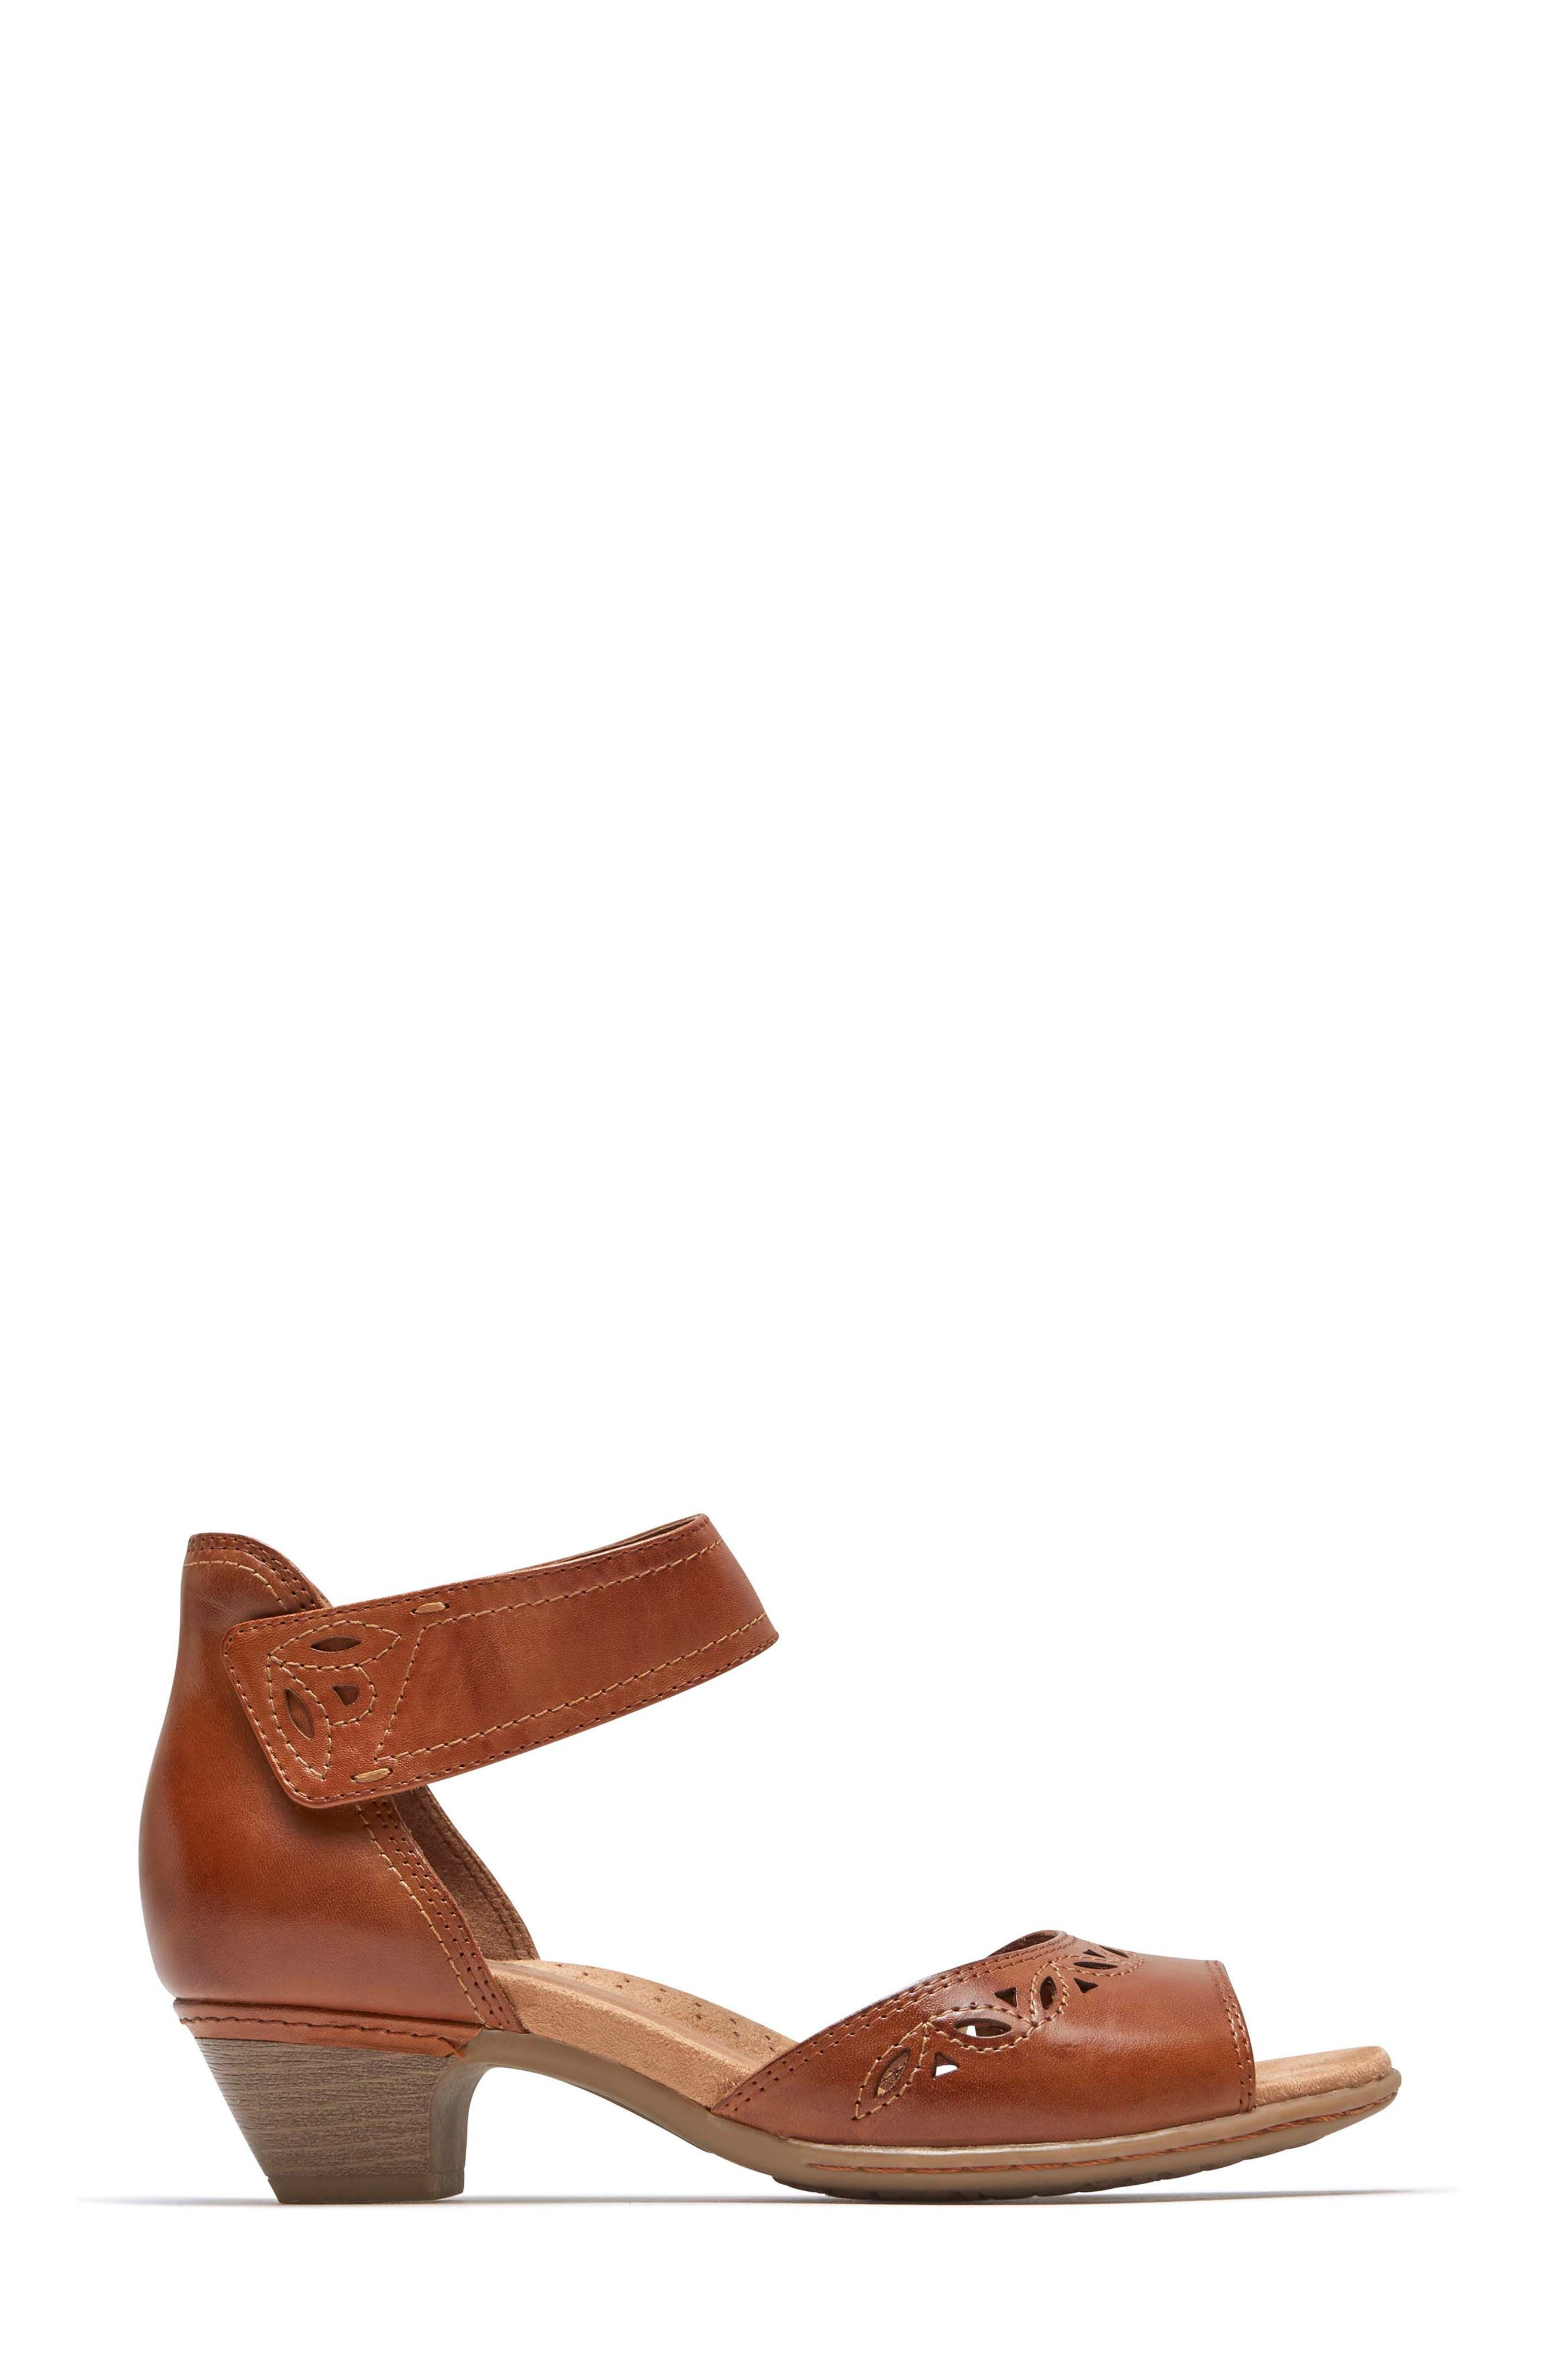 Abbott Perforated Sandal,                             Alternate thumbnail 3, color,                             Tan Leather